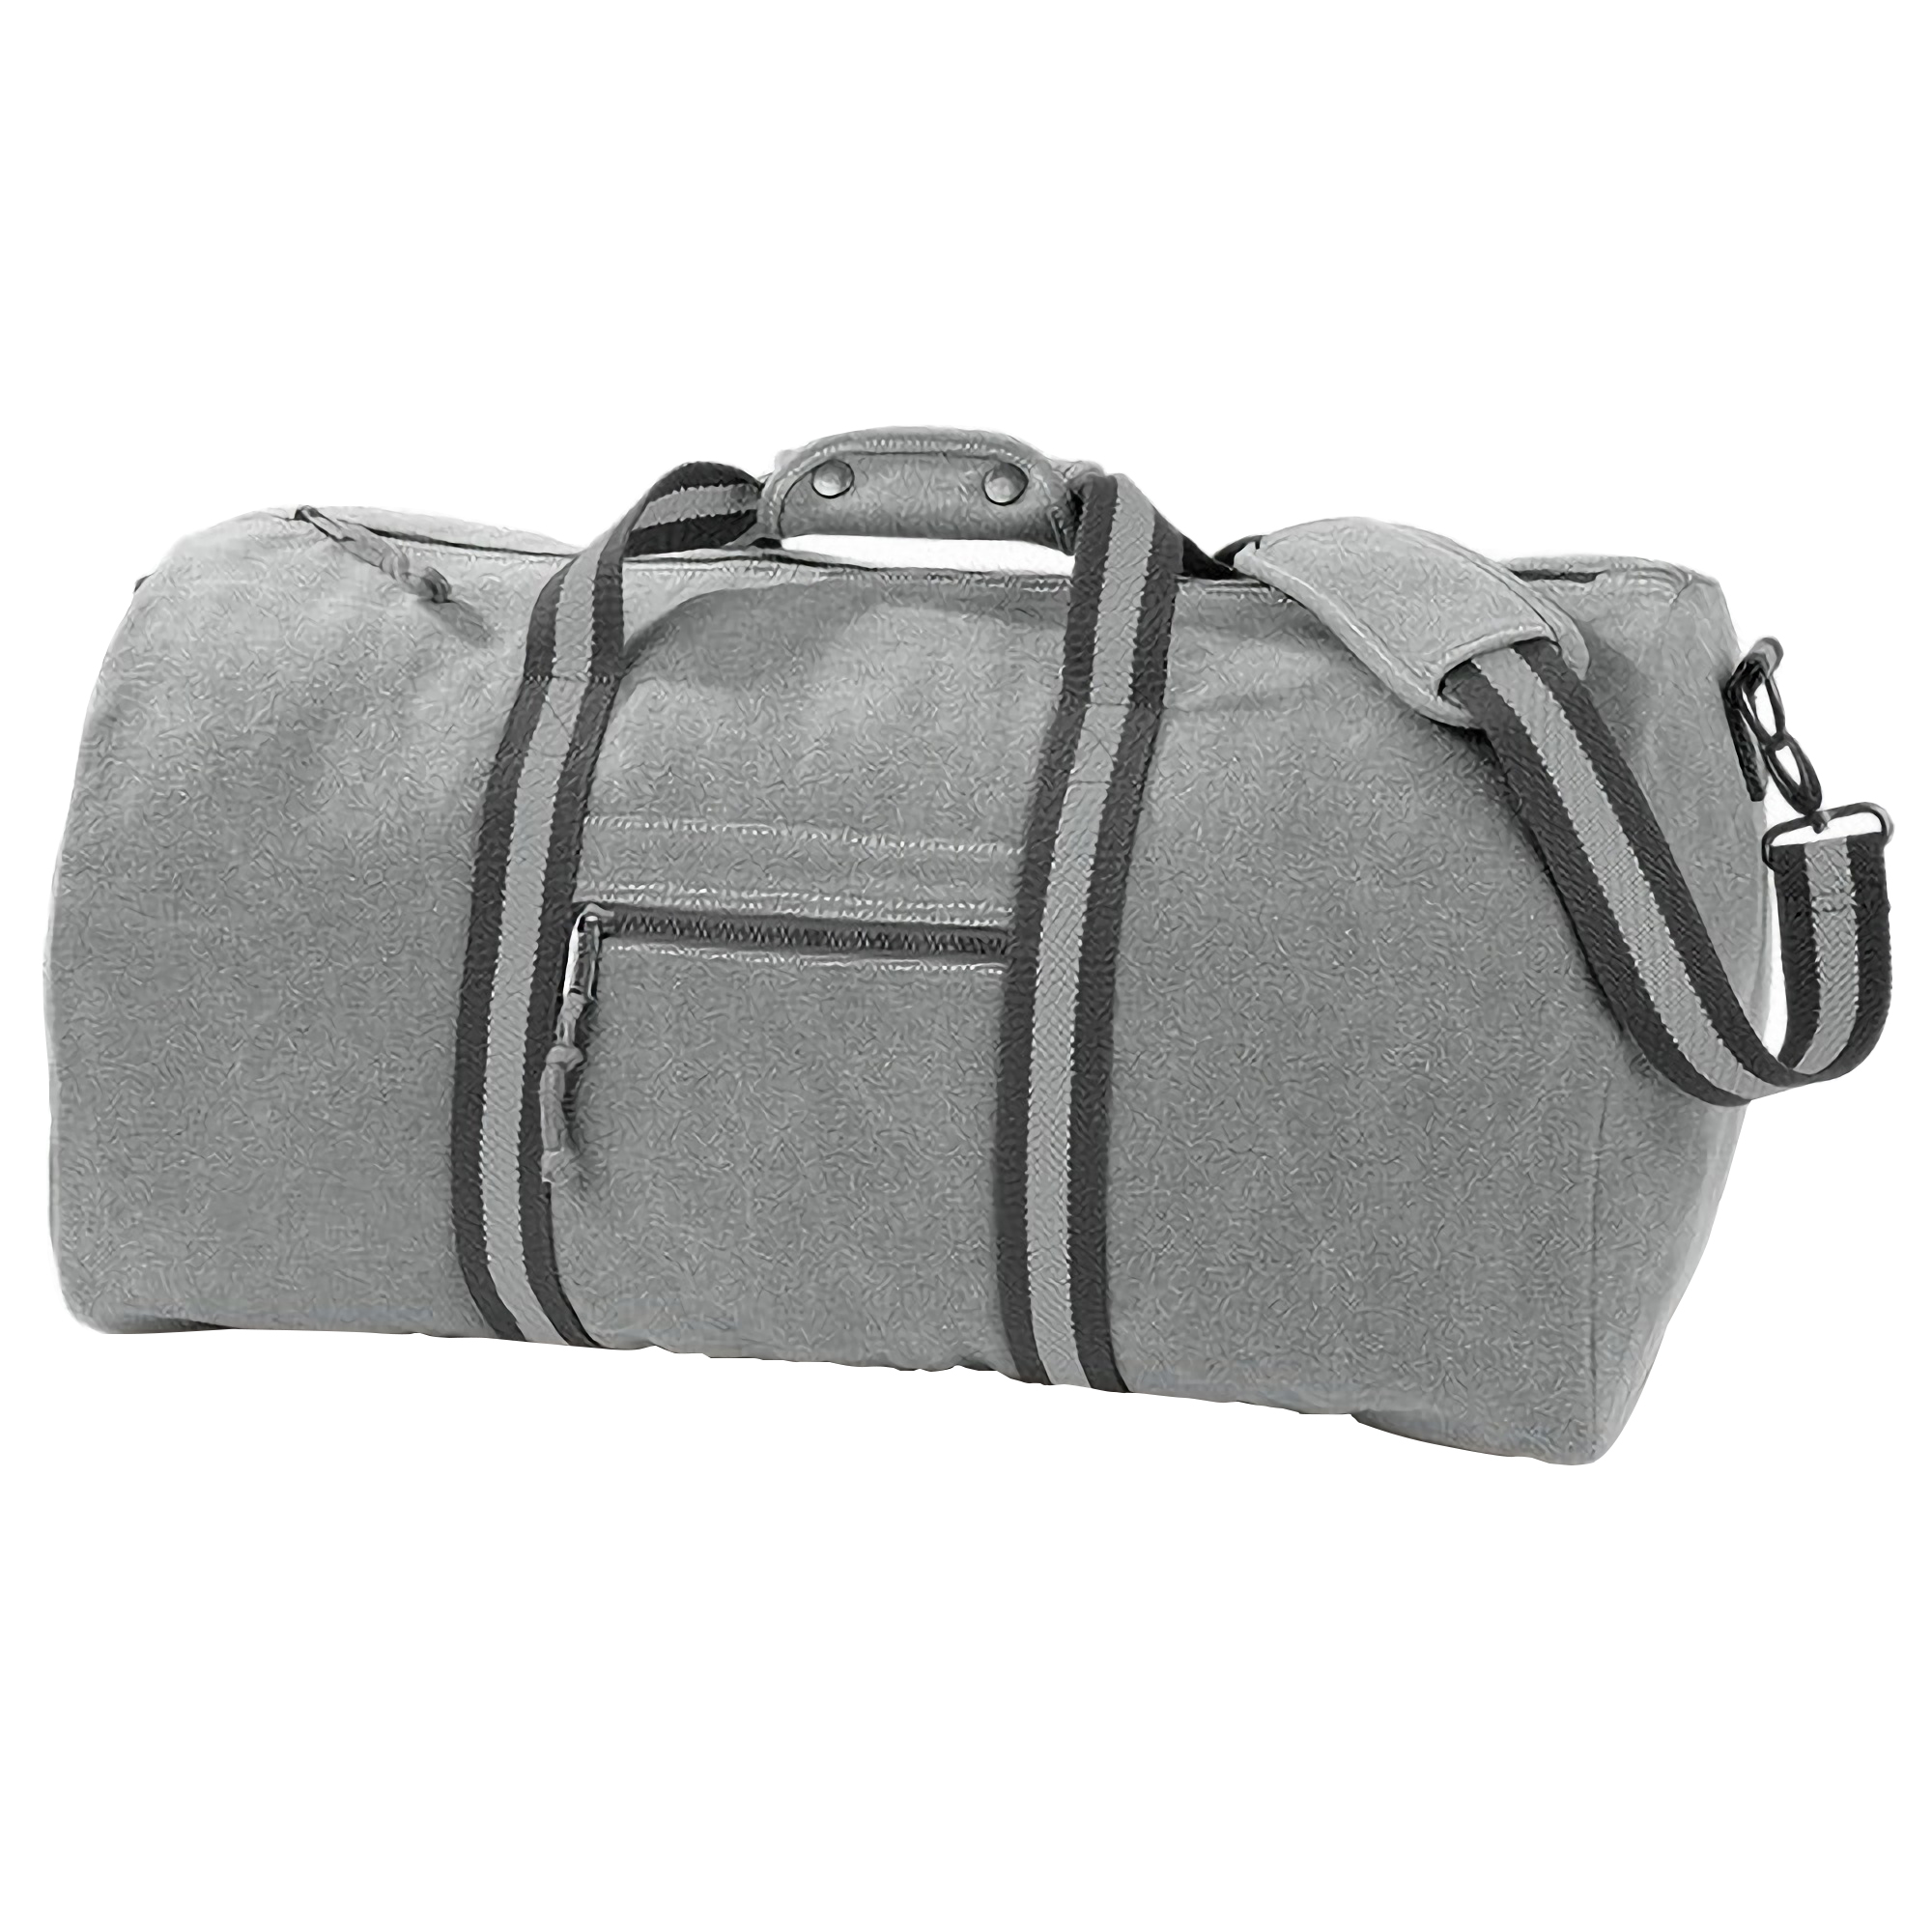 Quadra Vintage Canvas Holdall Duffle Bag - 45 Litres (One Size) (Vintage Light Grey)